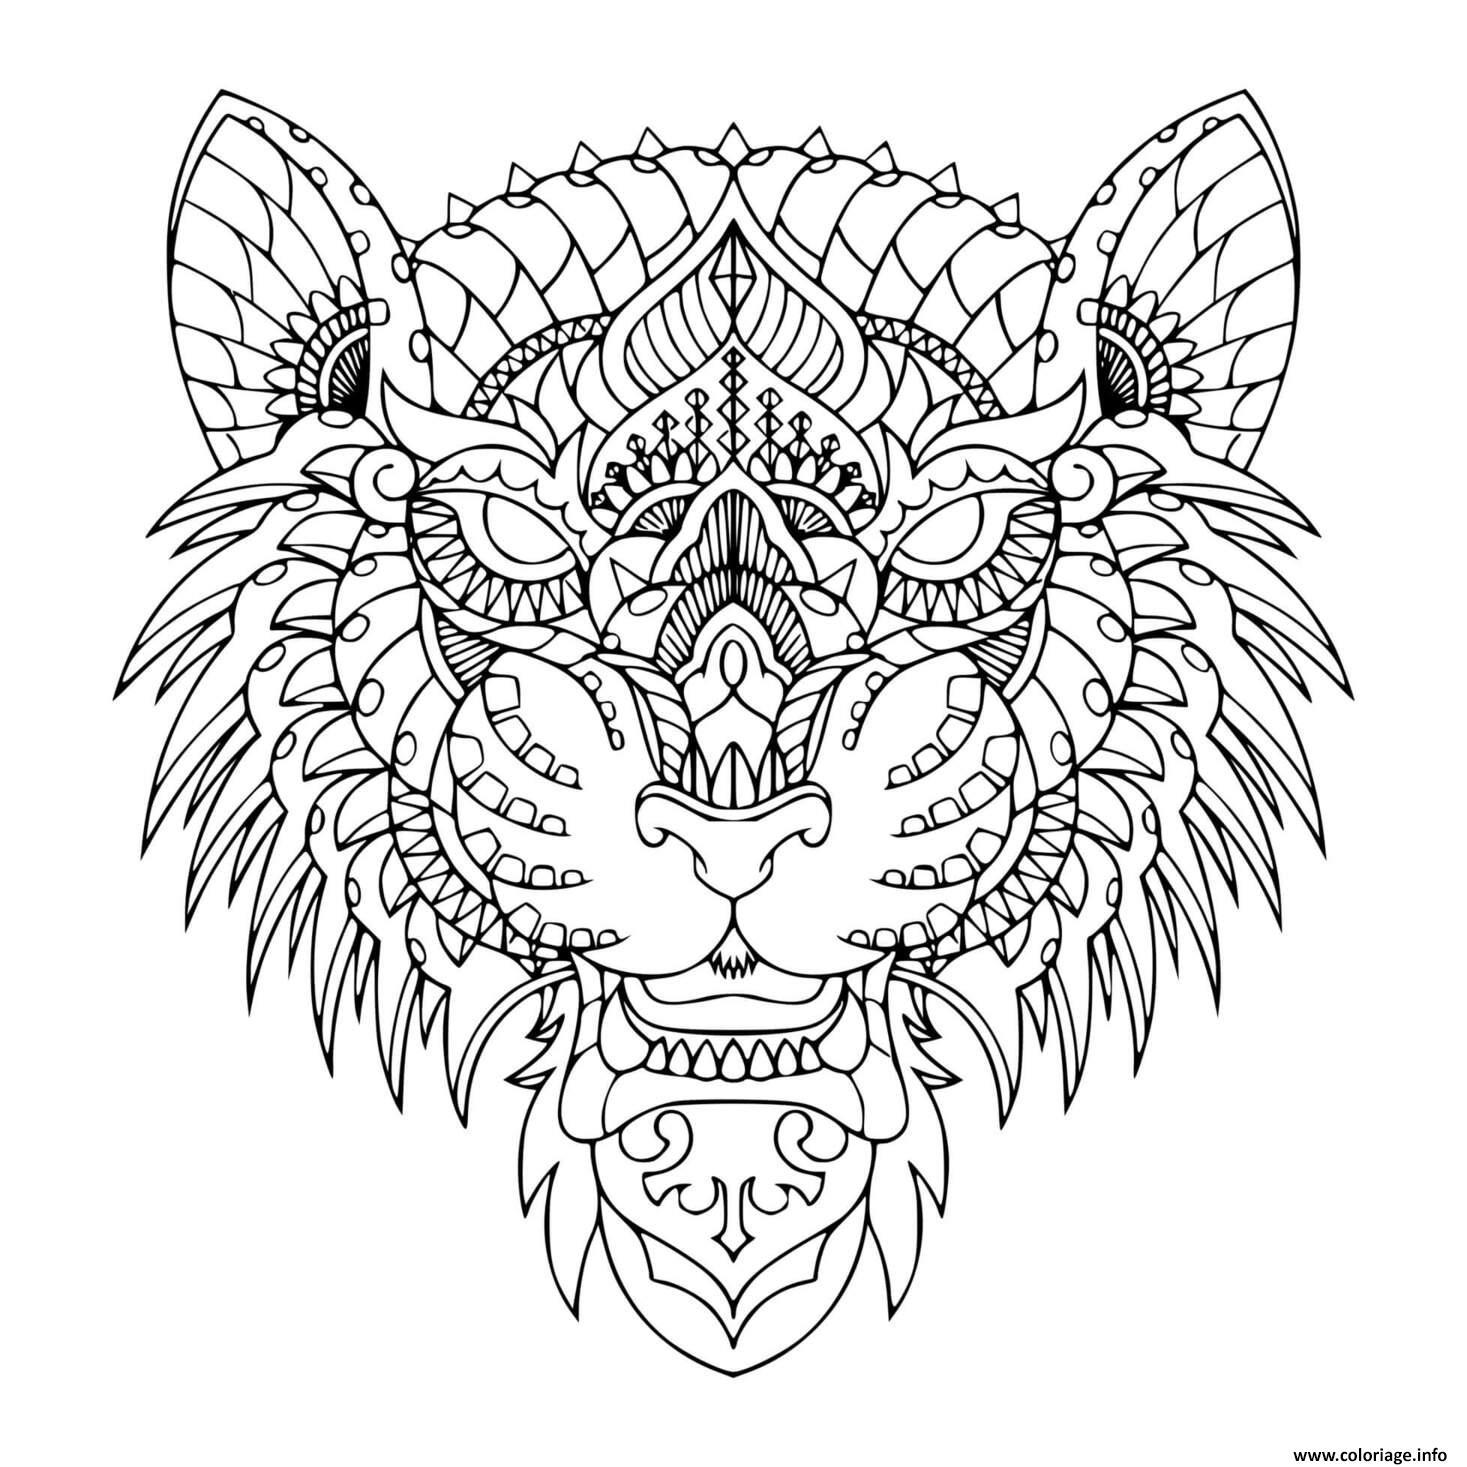 Dessin mandala tigre zen Coloriage Gratuit à Imprimer